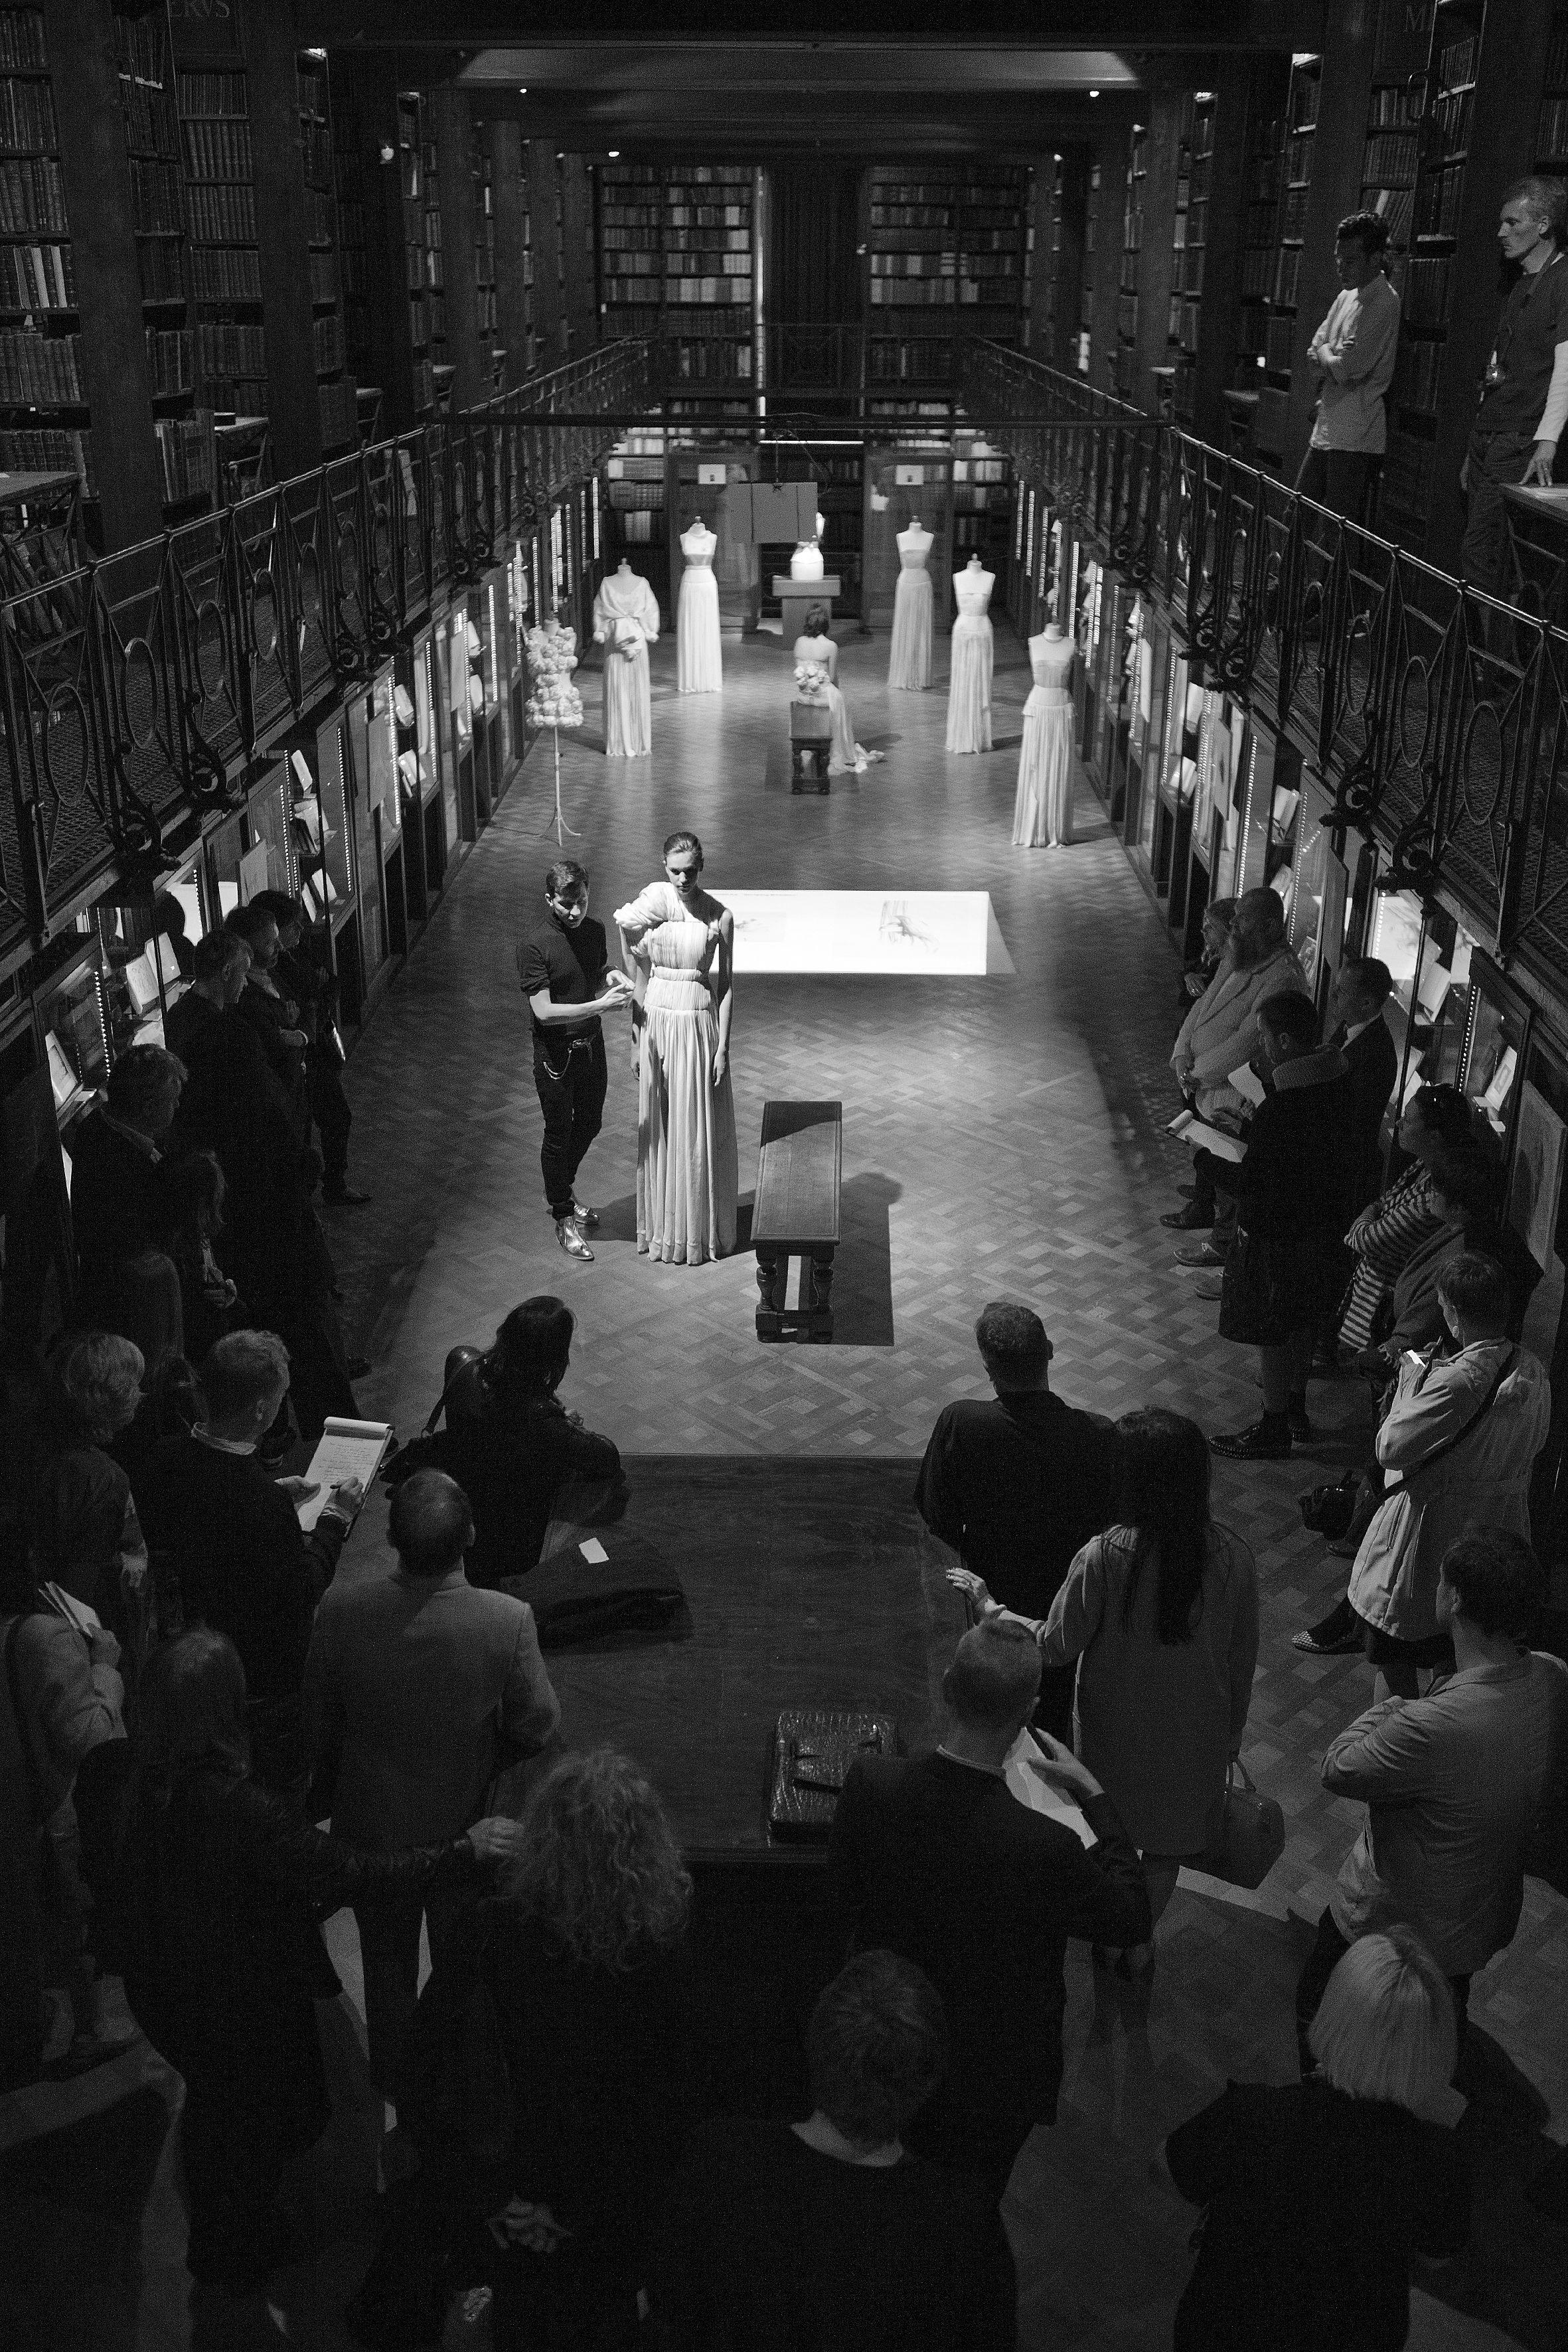 Photographer Dirk Alexander_Marius Janusauskas presentation at Erfgoedbibliotheek Hendrik Conscience